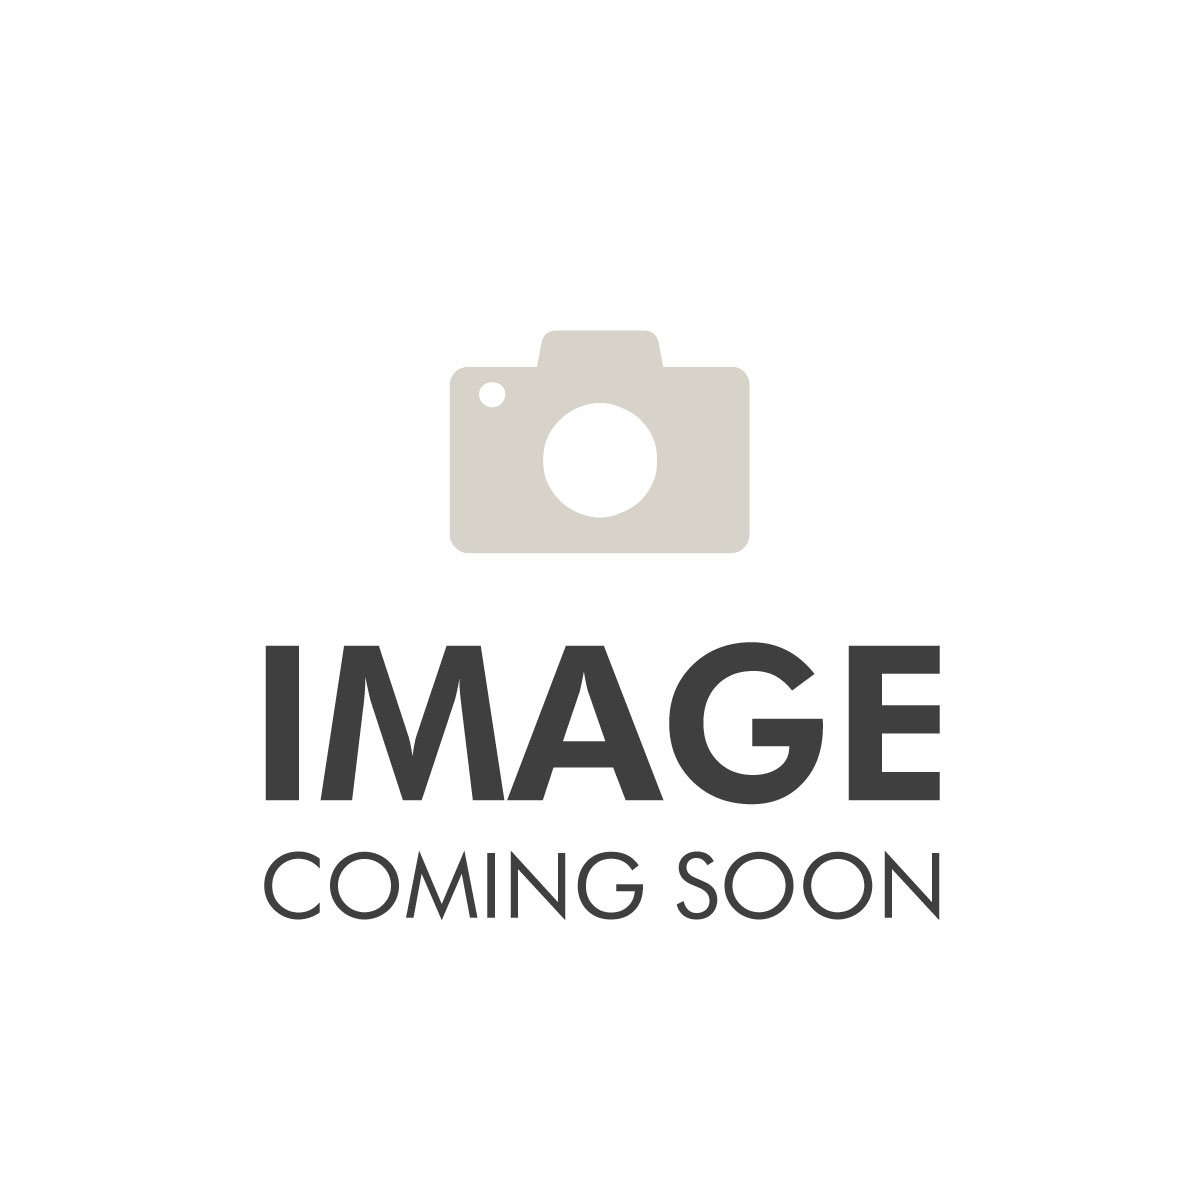 Imex - Fourreau rigide - Fleuret/Sabre